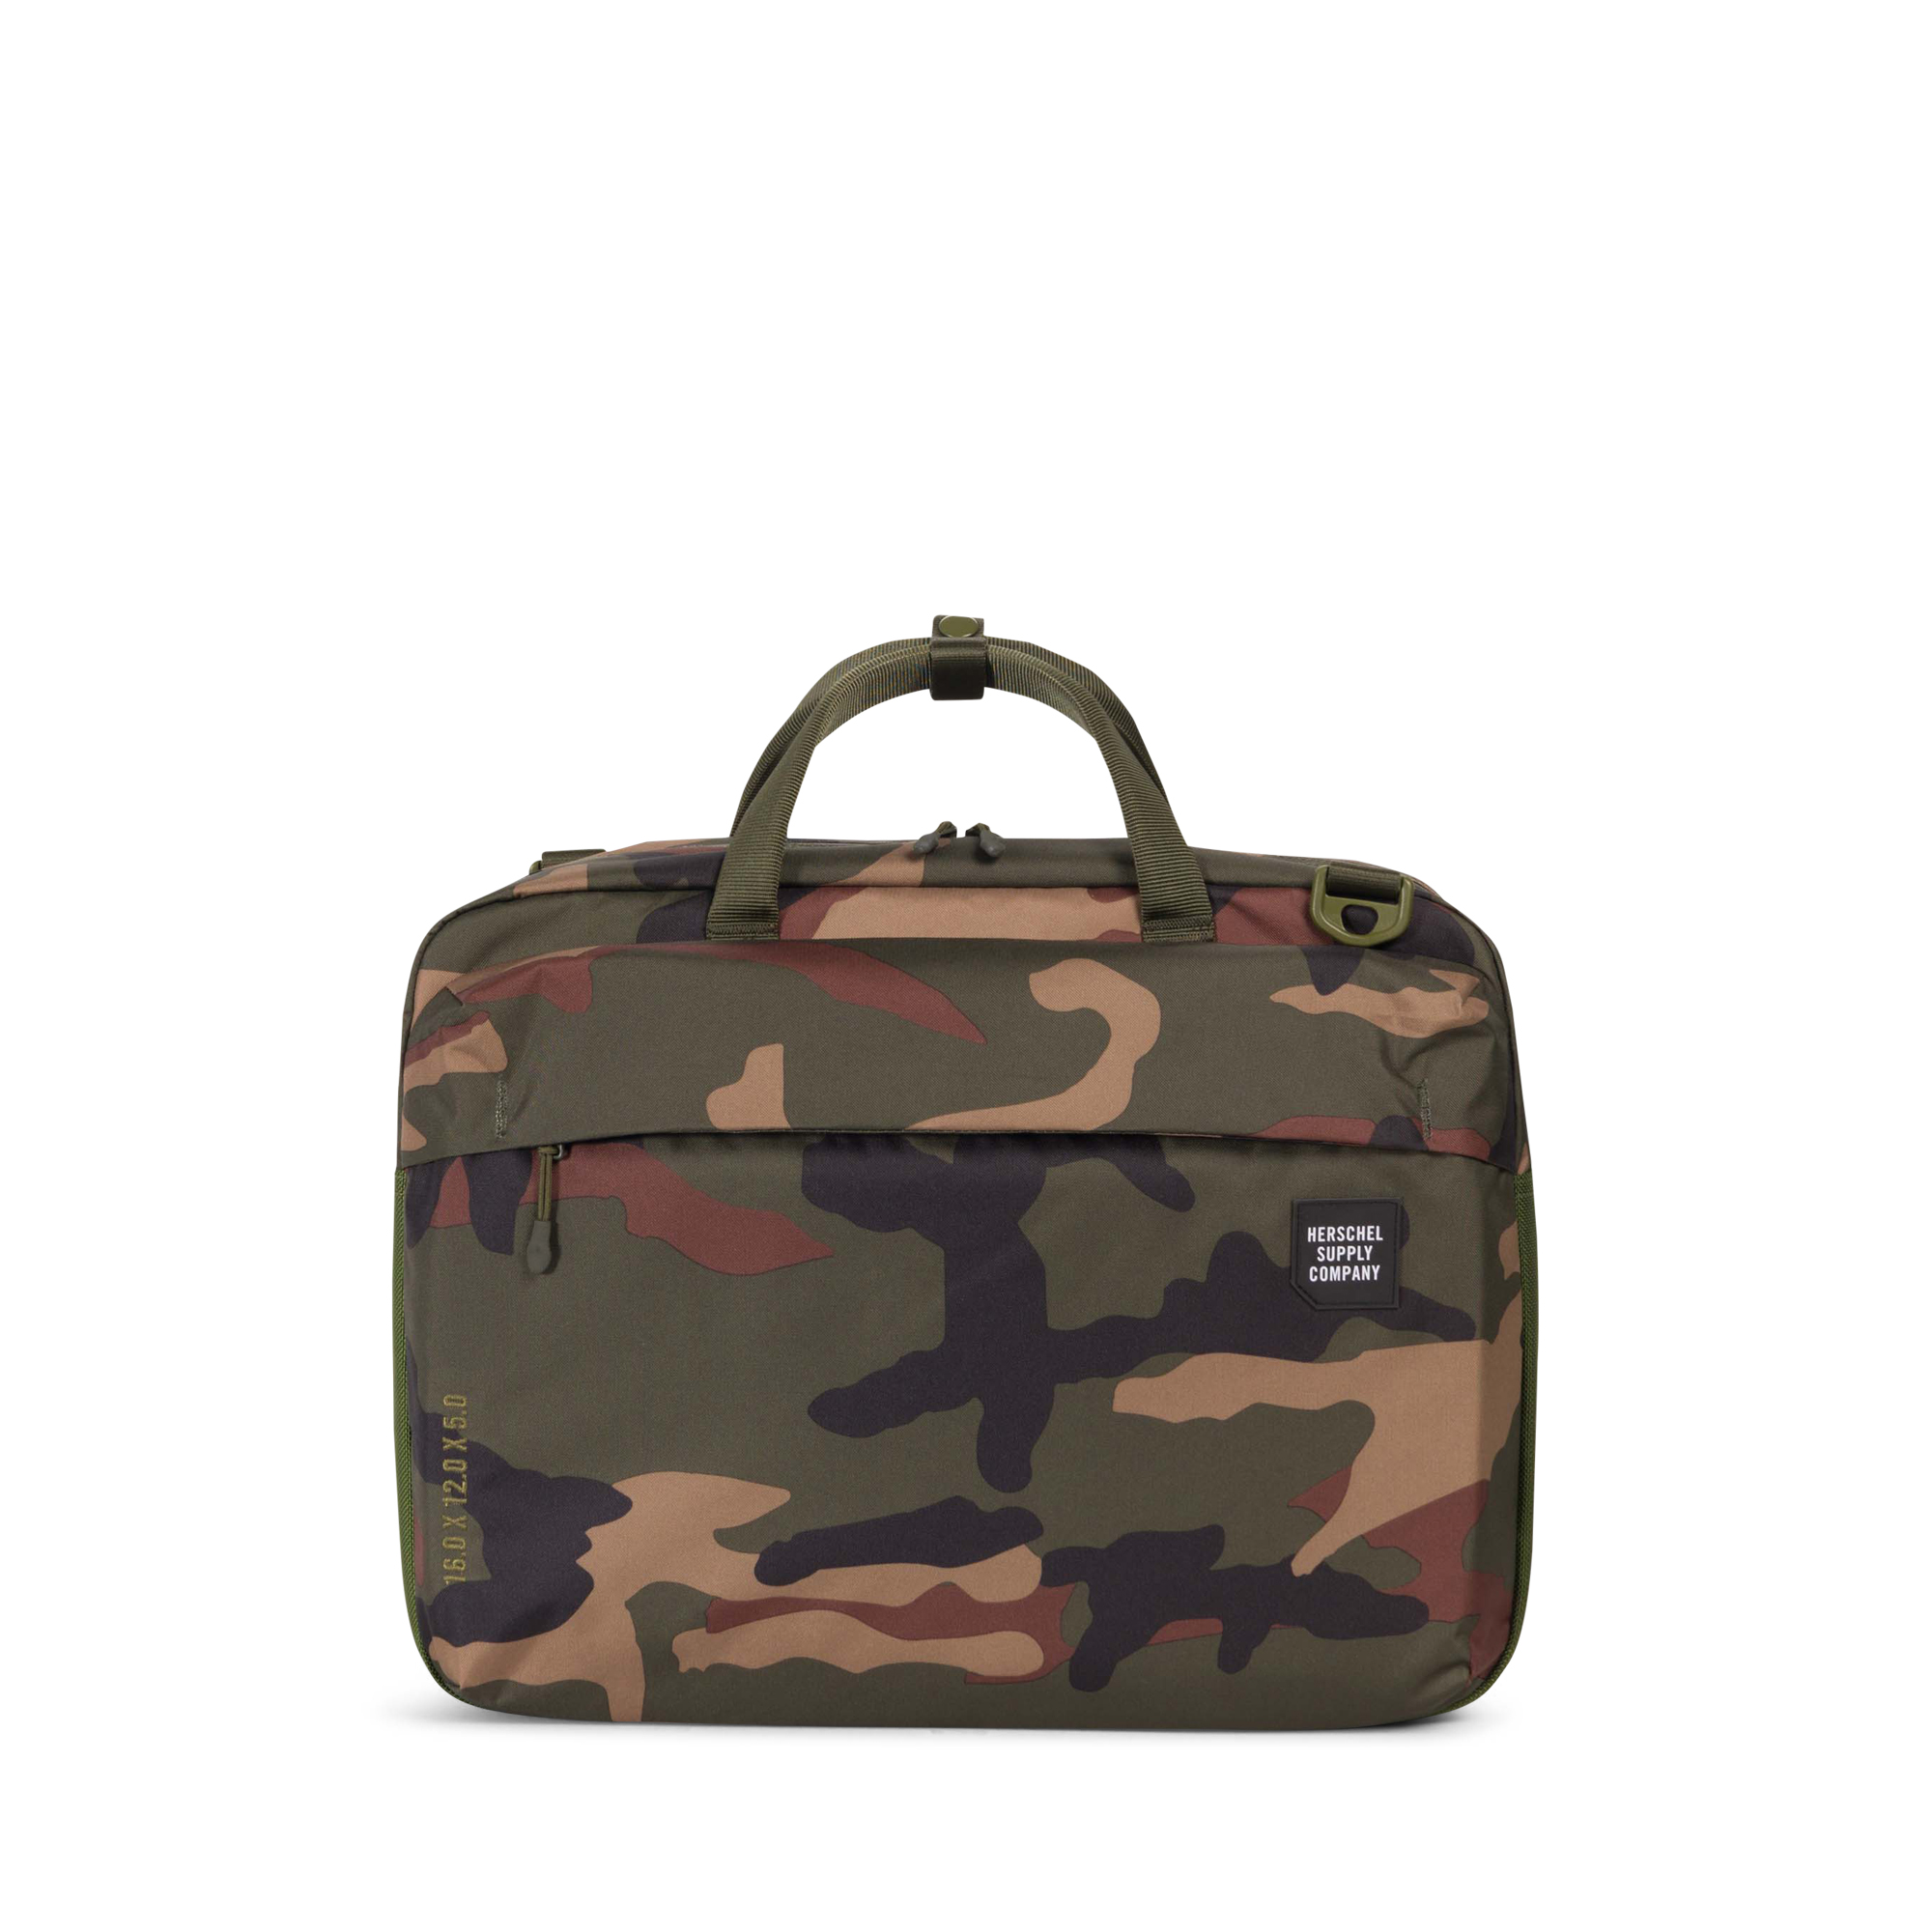 ded917a564 Men s Messenger Bags